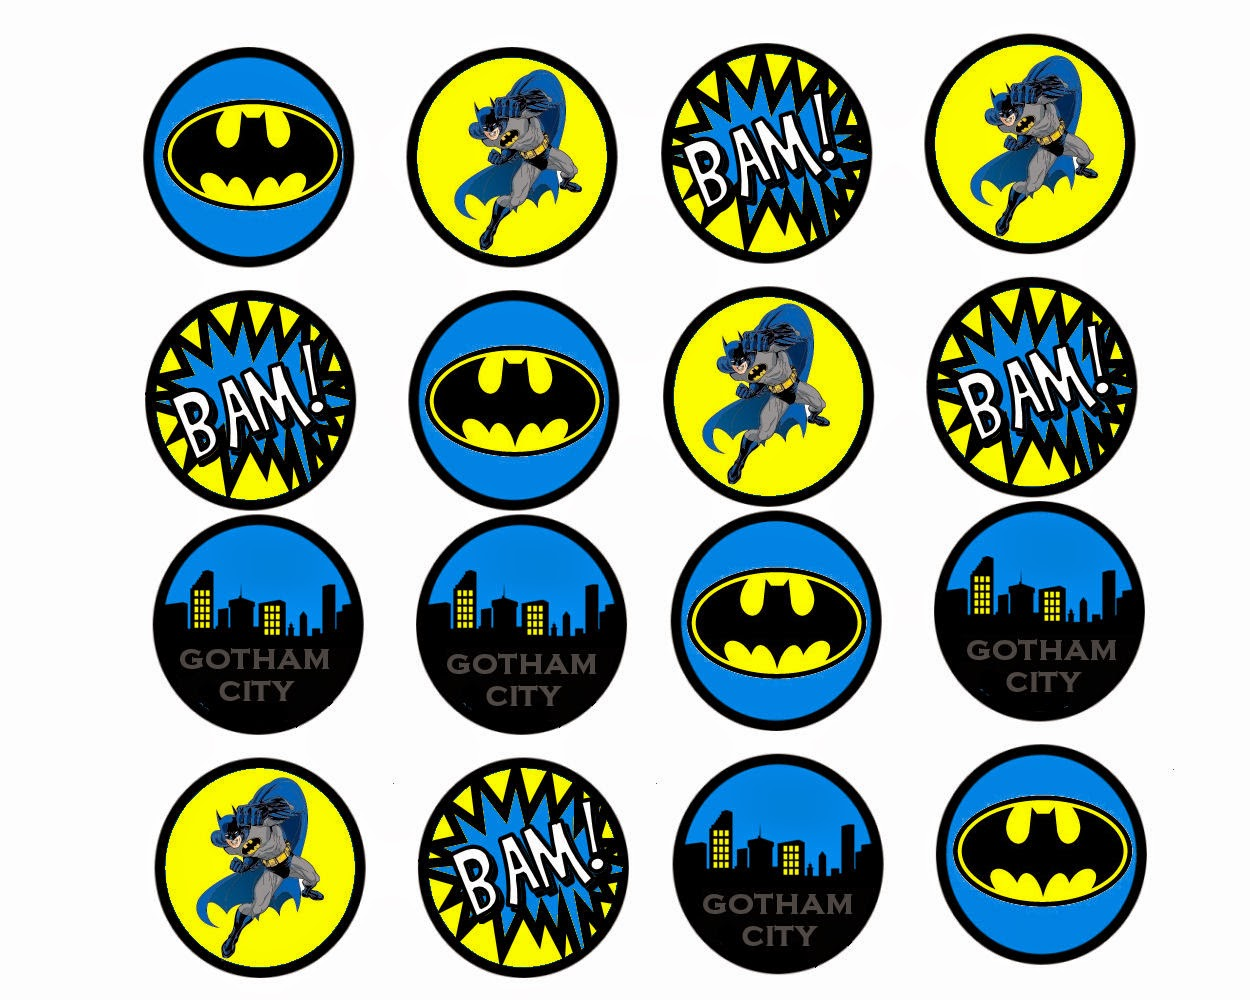 Batman Free Printable Mini Kit Is It For PARTIES